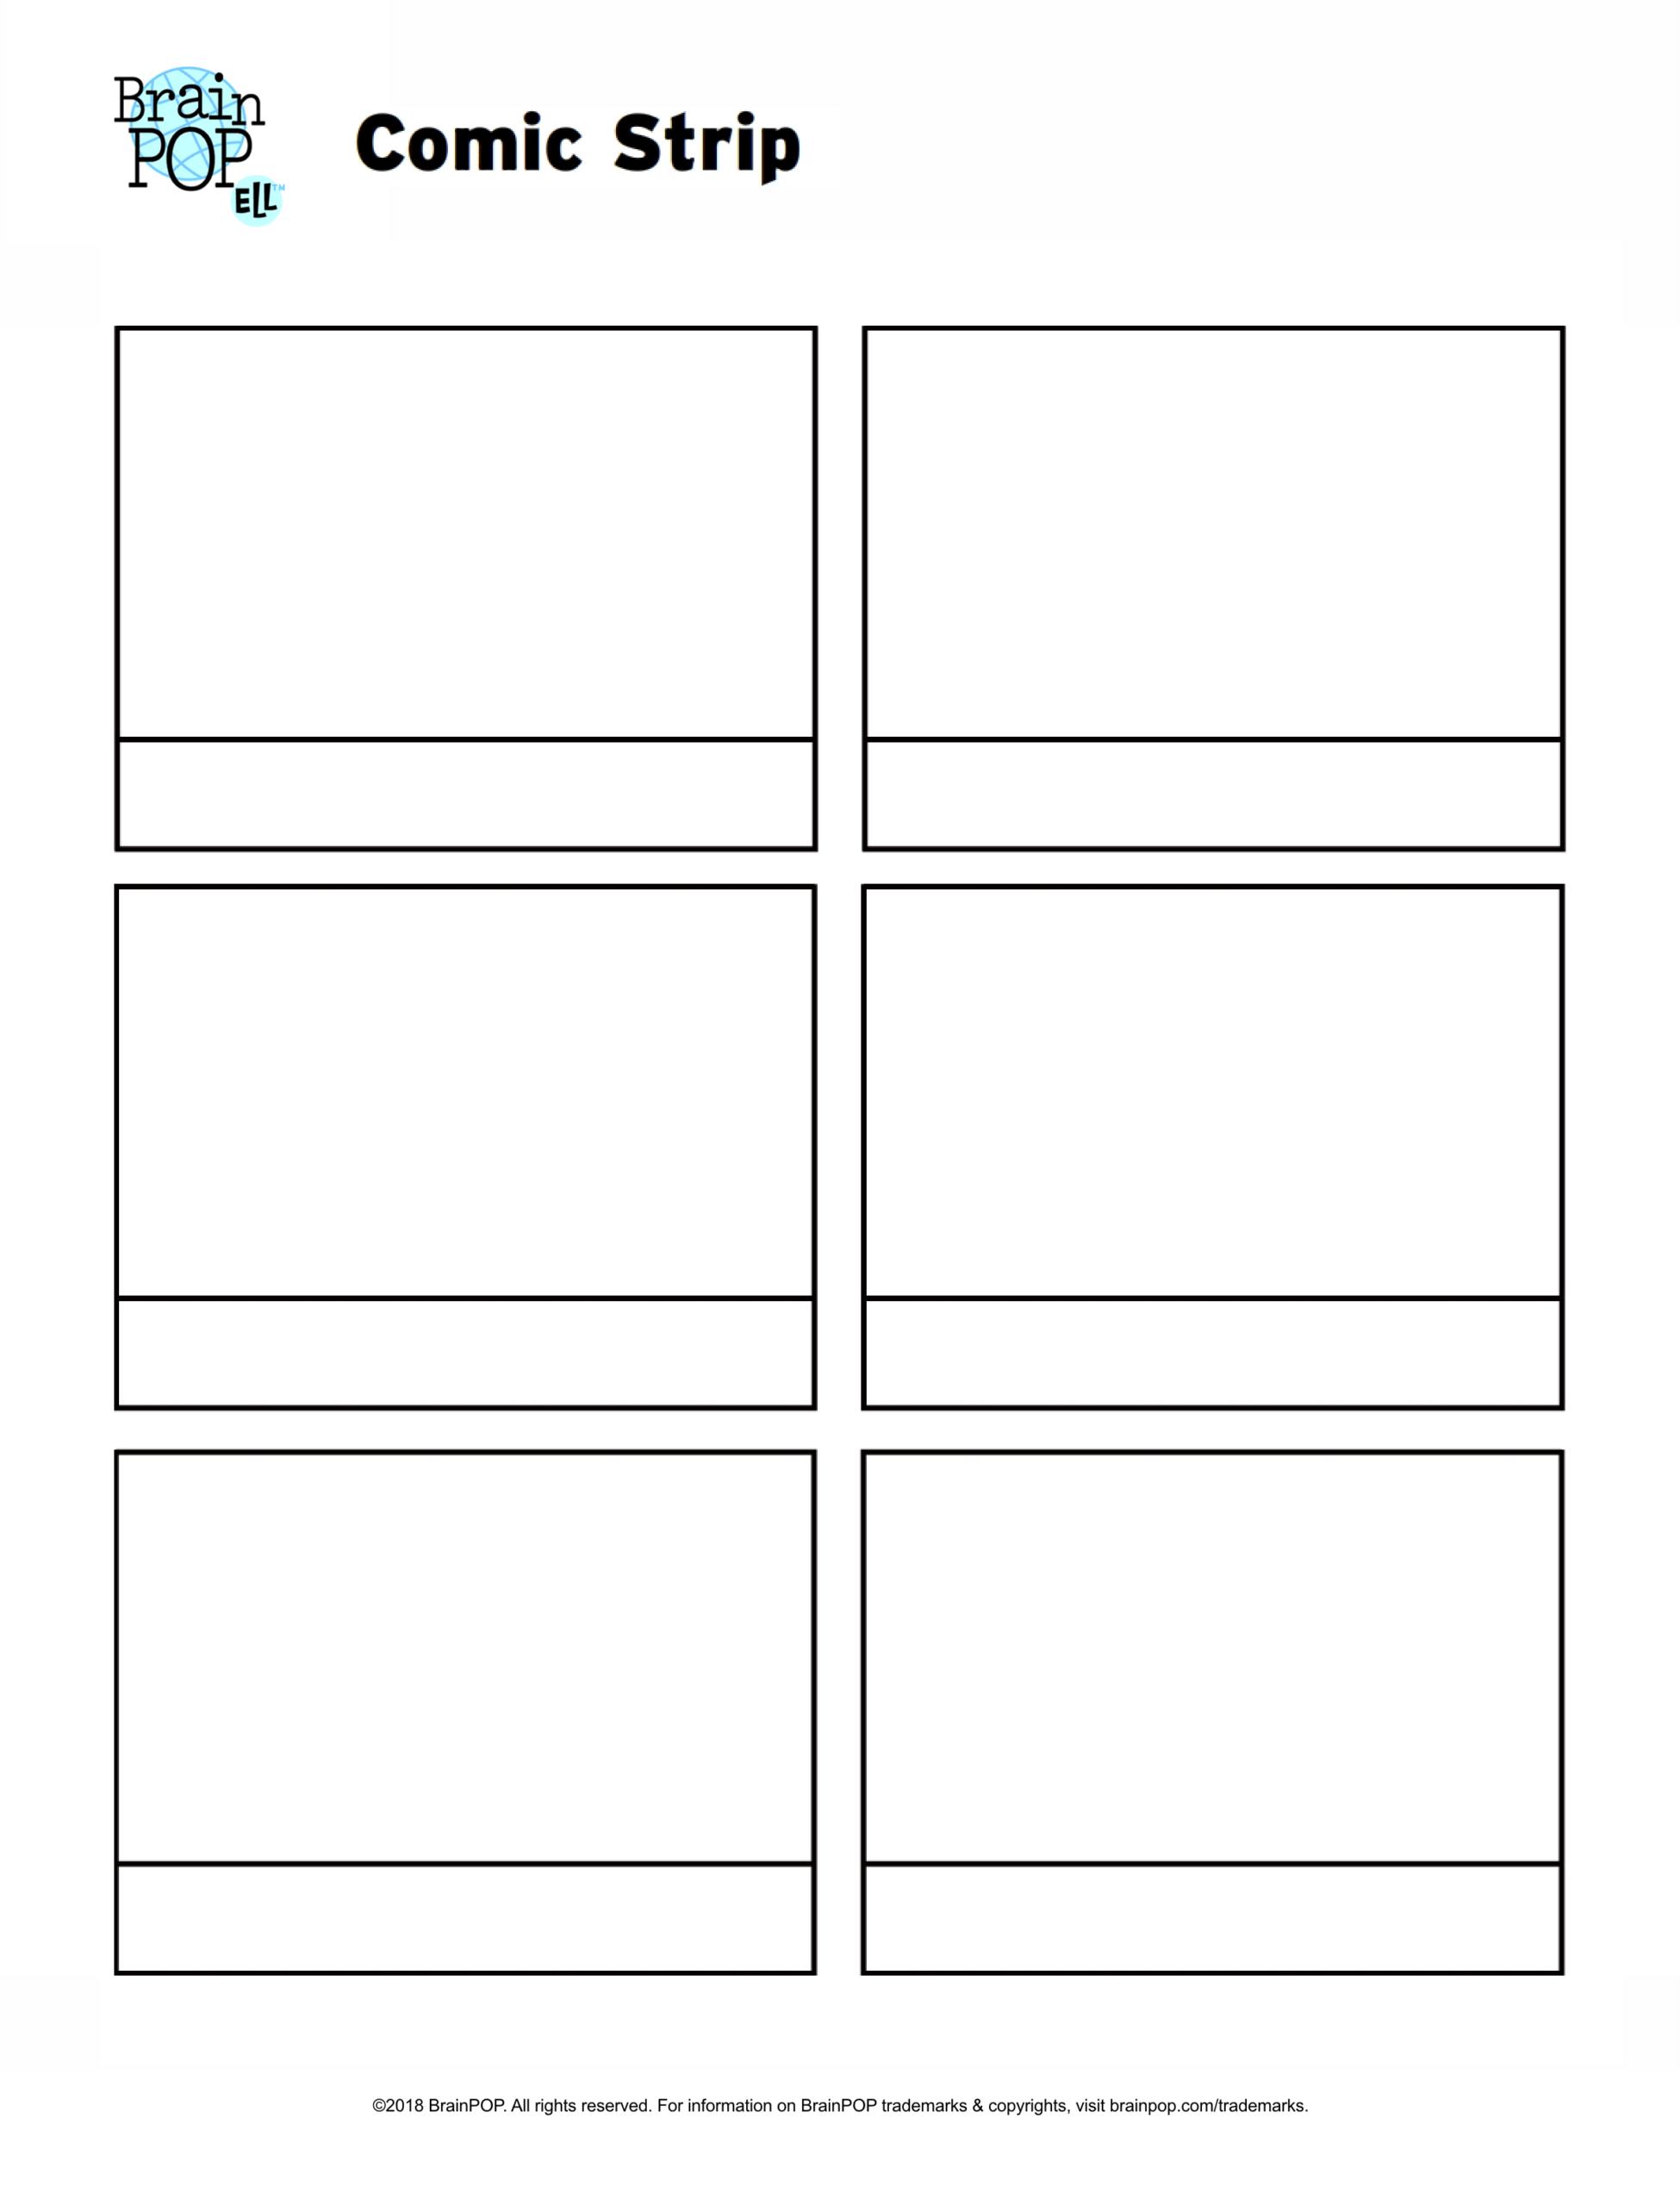 Comic Strips Template – Ironi.celikdemirsan With Printable Blank Comic Strip Template For Kids